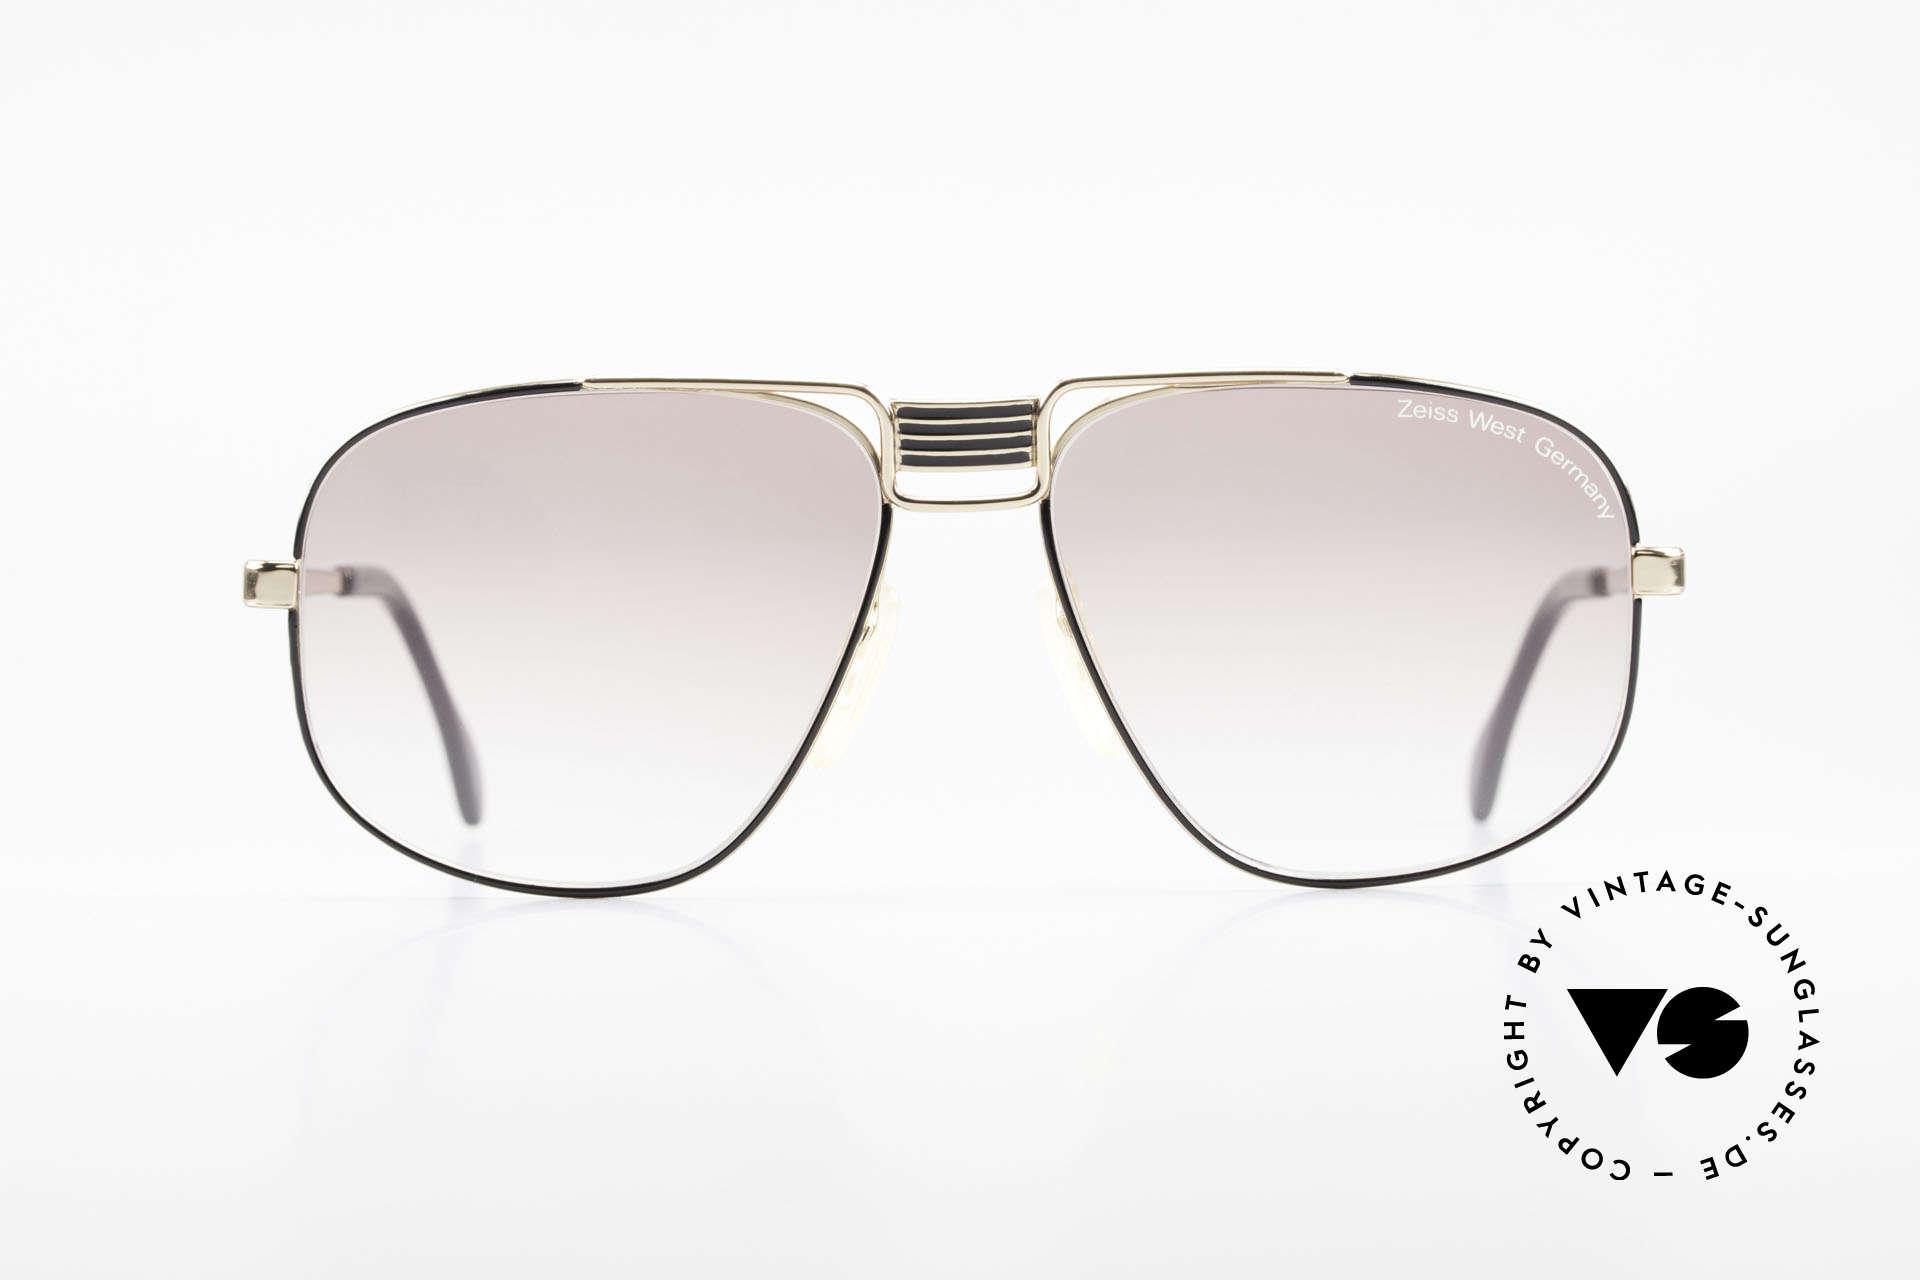 Zeiss 9387 X-Large 80's Men's Sunglasses, elegant frame construction in X-LARGE SIZE 60-16, Made for Men